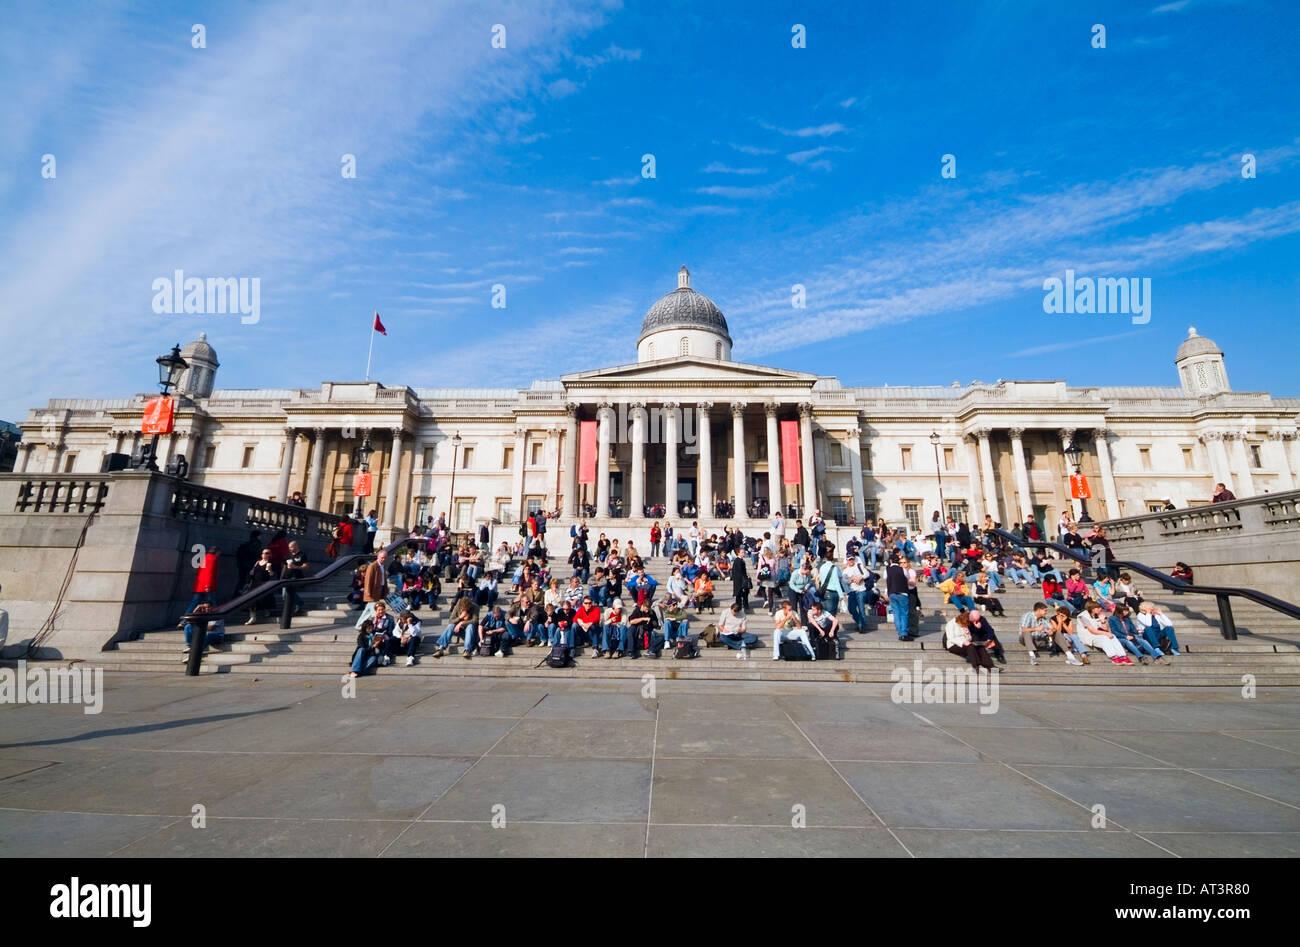 UK United Kingdom GB Great Britain British Isles England English Commonwealth Europe EC European Community EEC European Economic - Stock Image